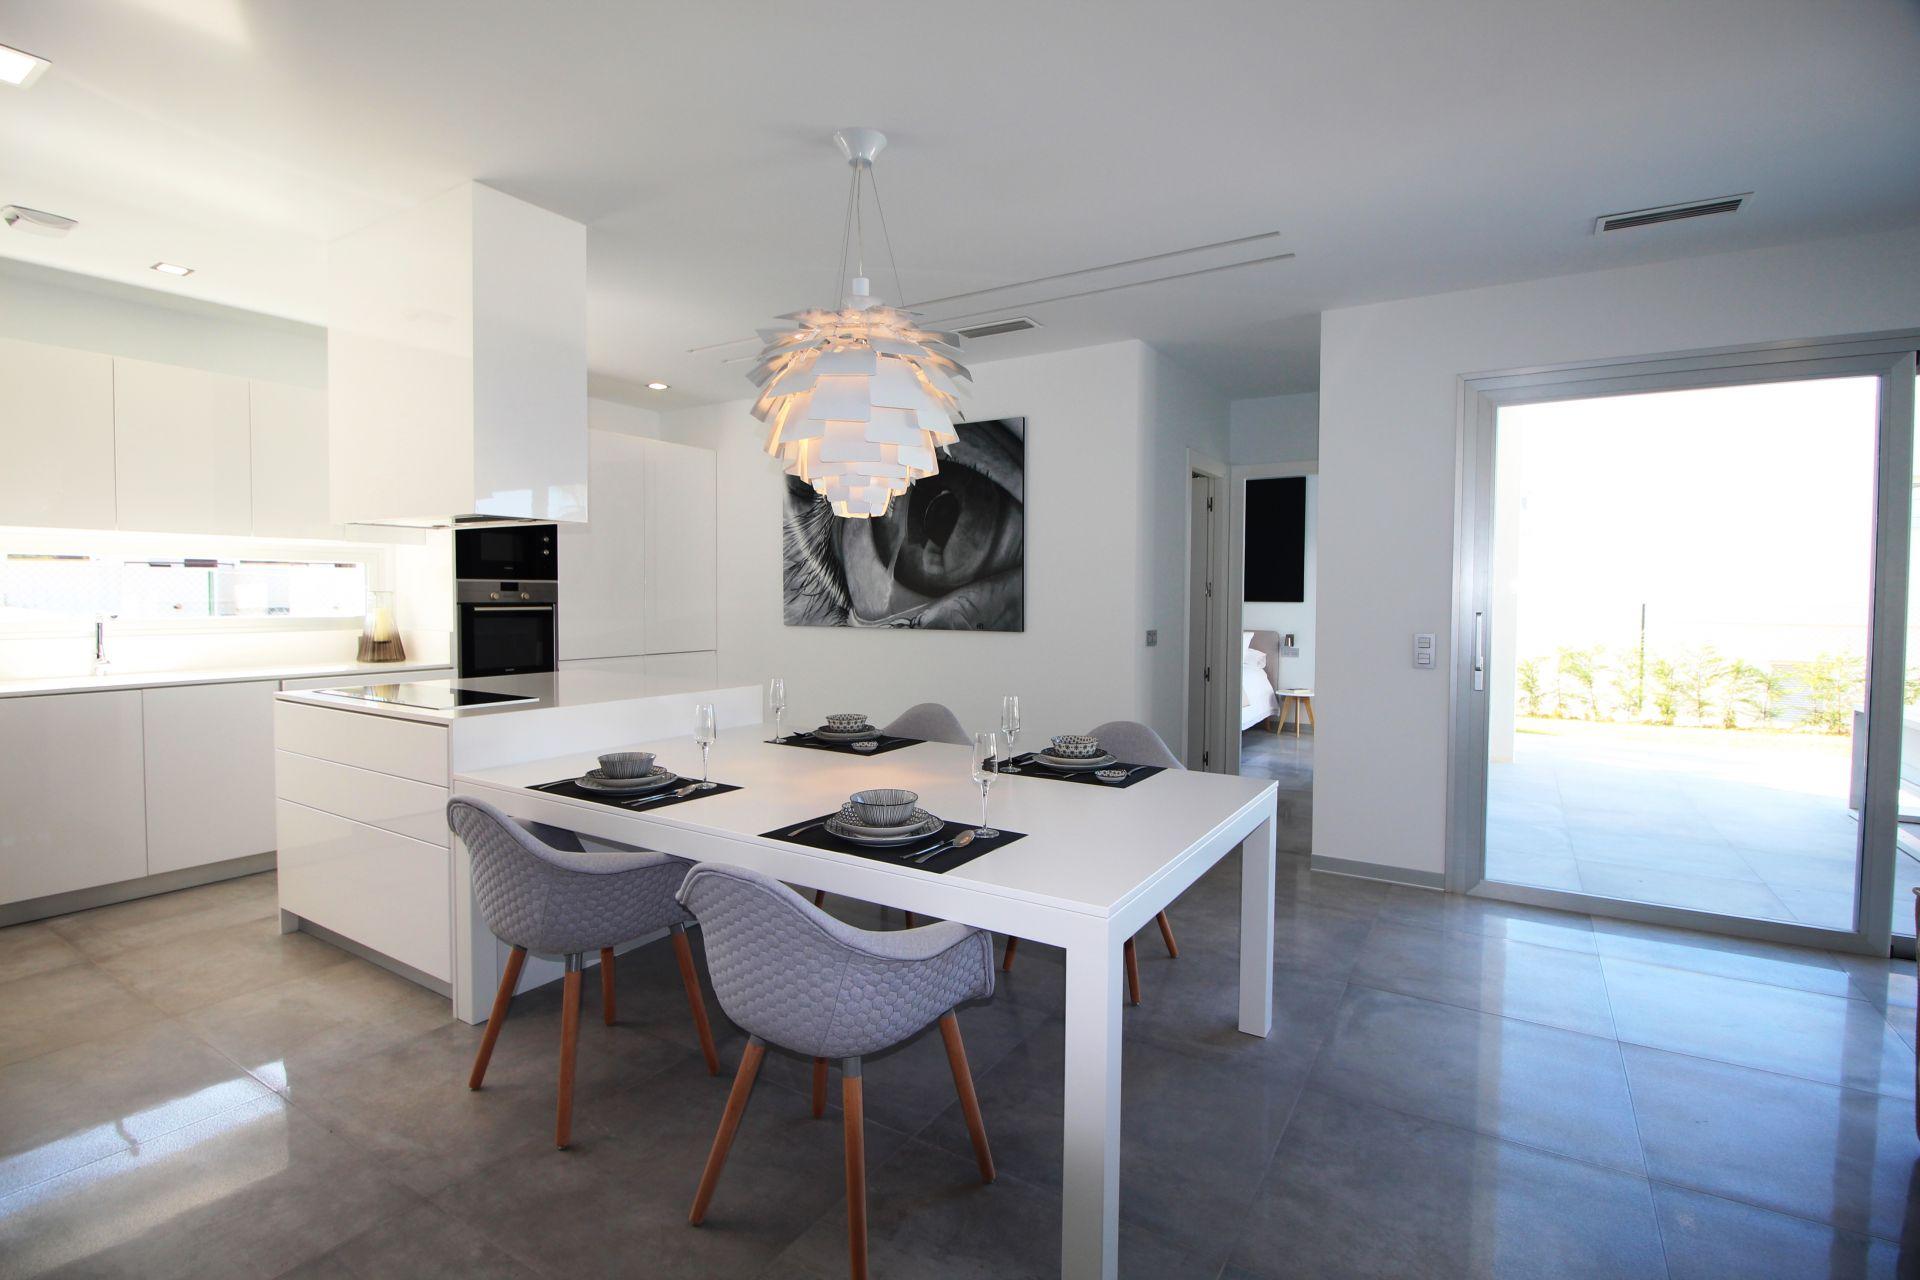 Exclusive villas with 3 bedrooms in Finestrat 7